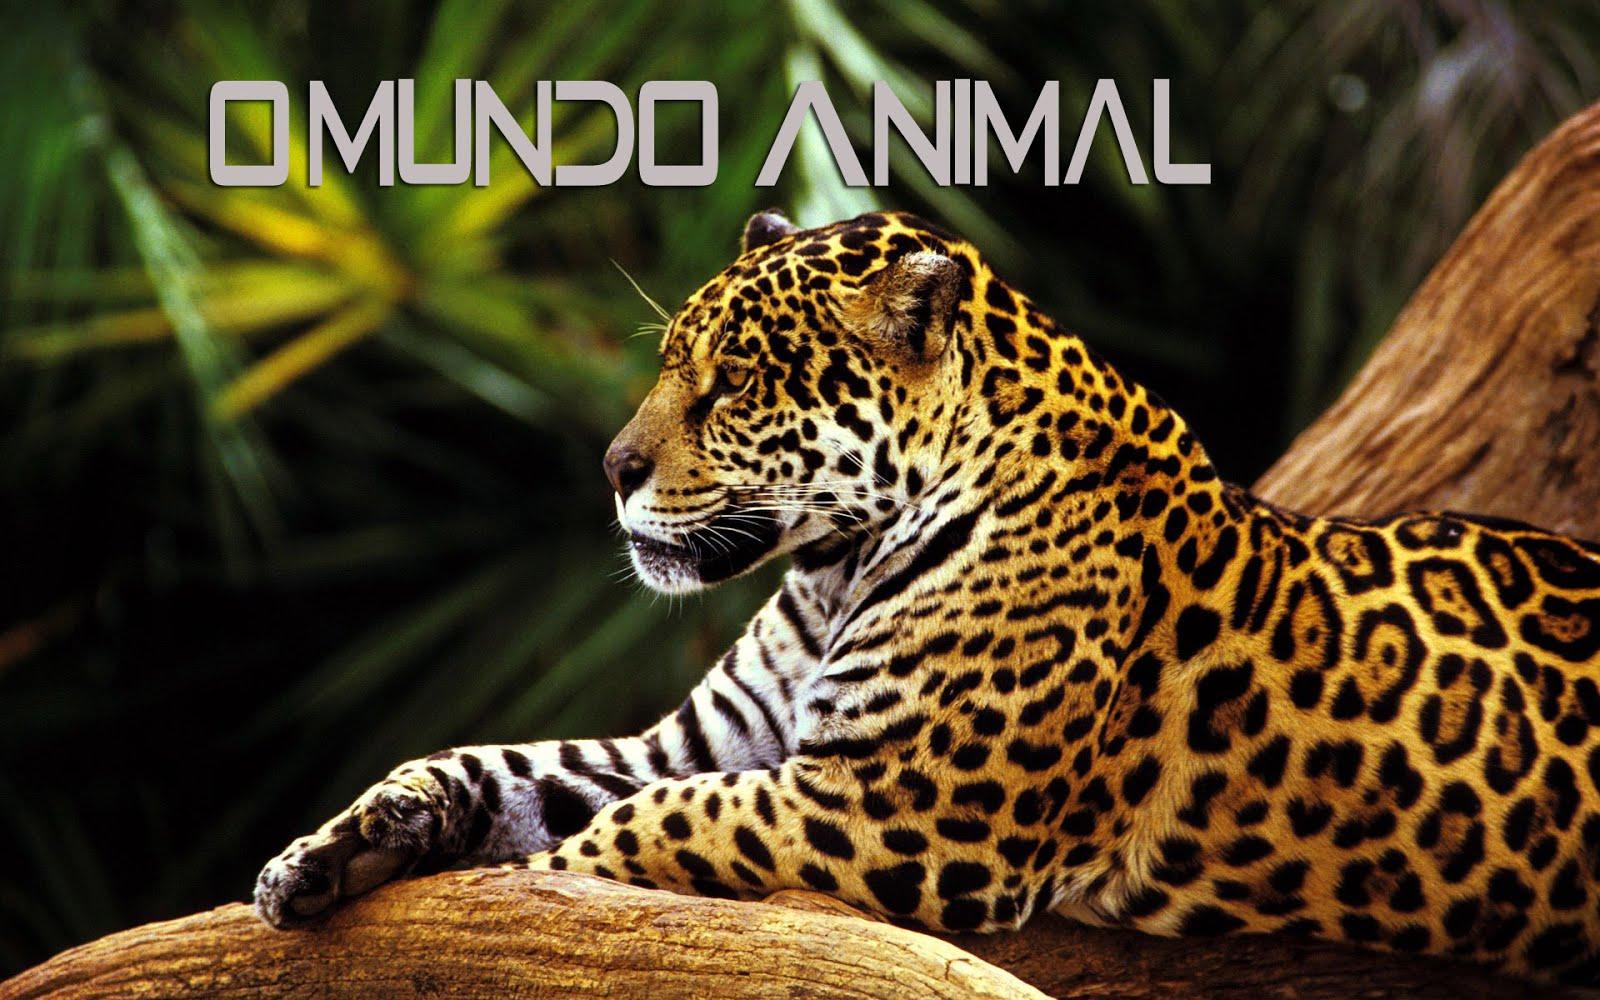 O Mundo Animal